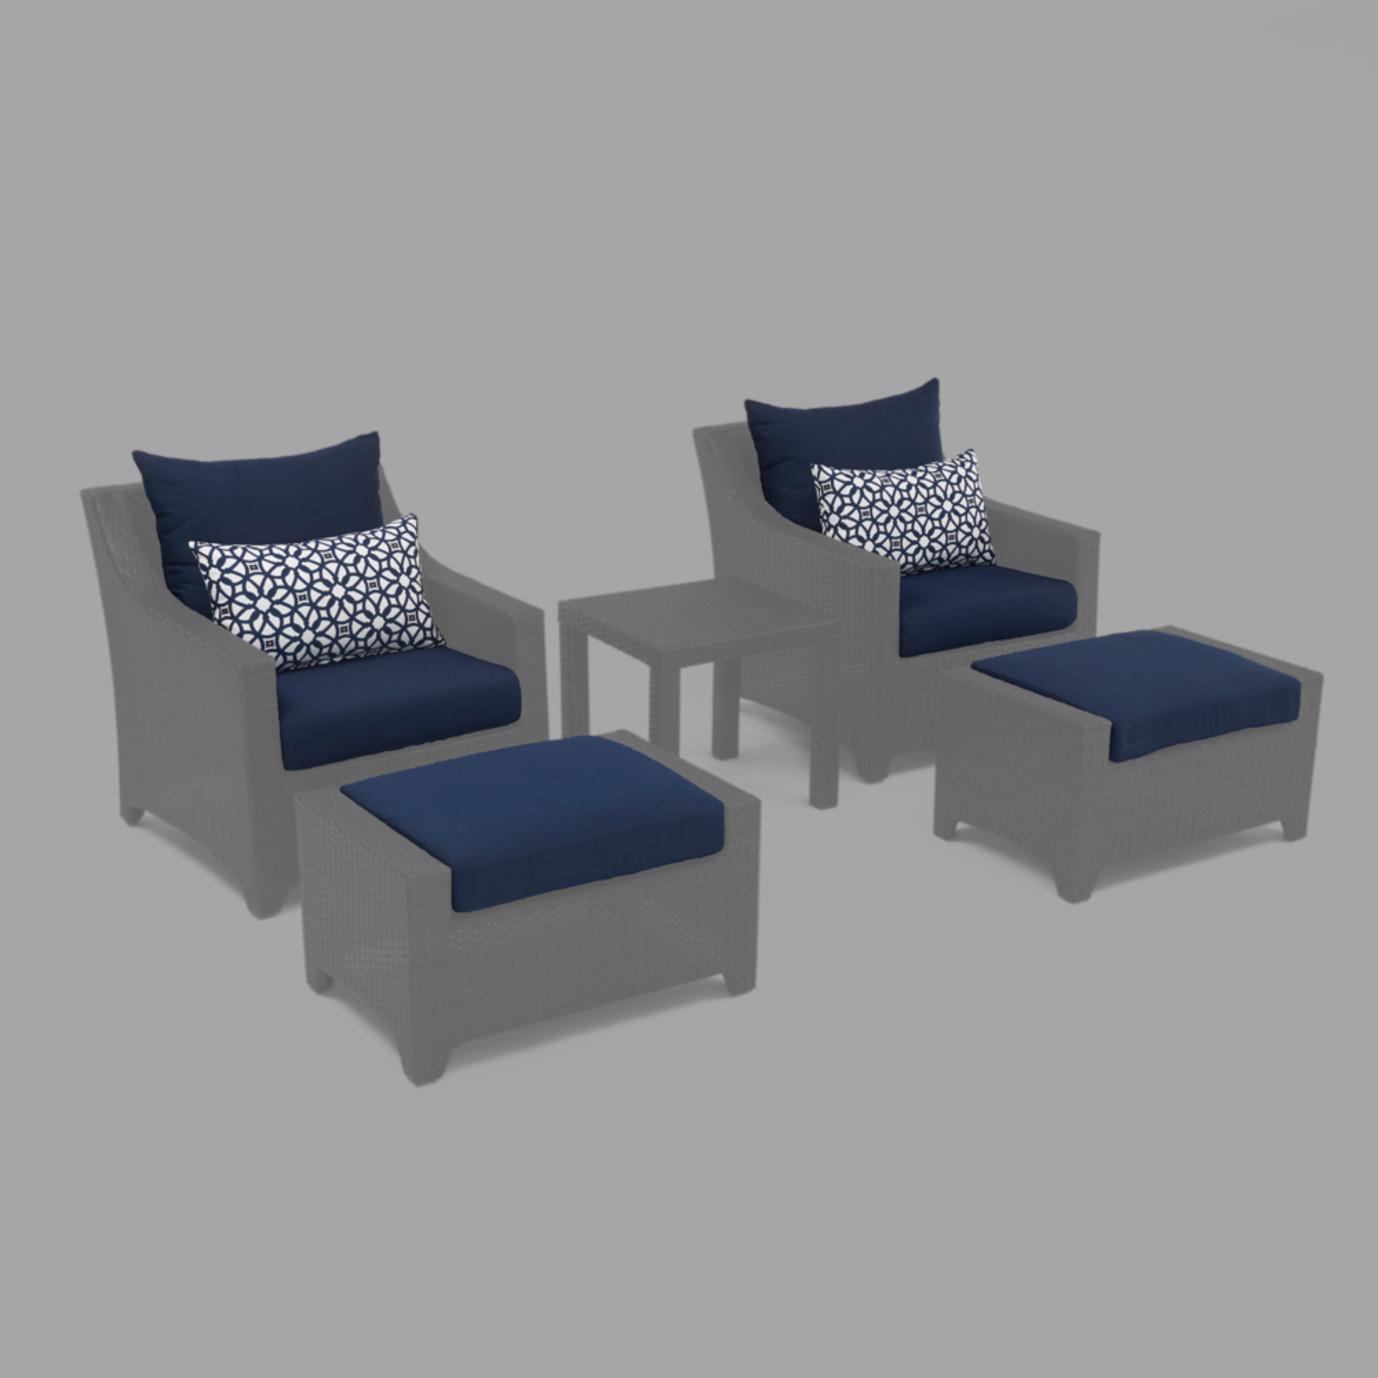 Modular Outdoor 5 Piece Club Cushion Cover Set